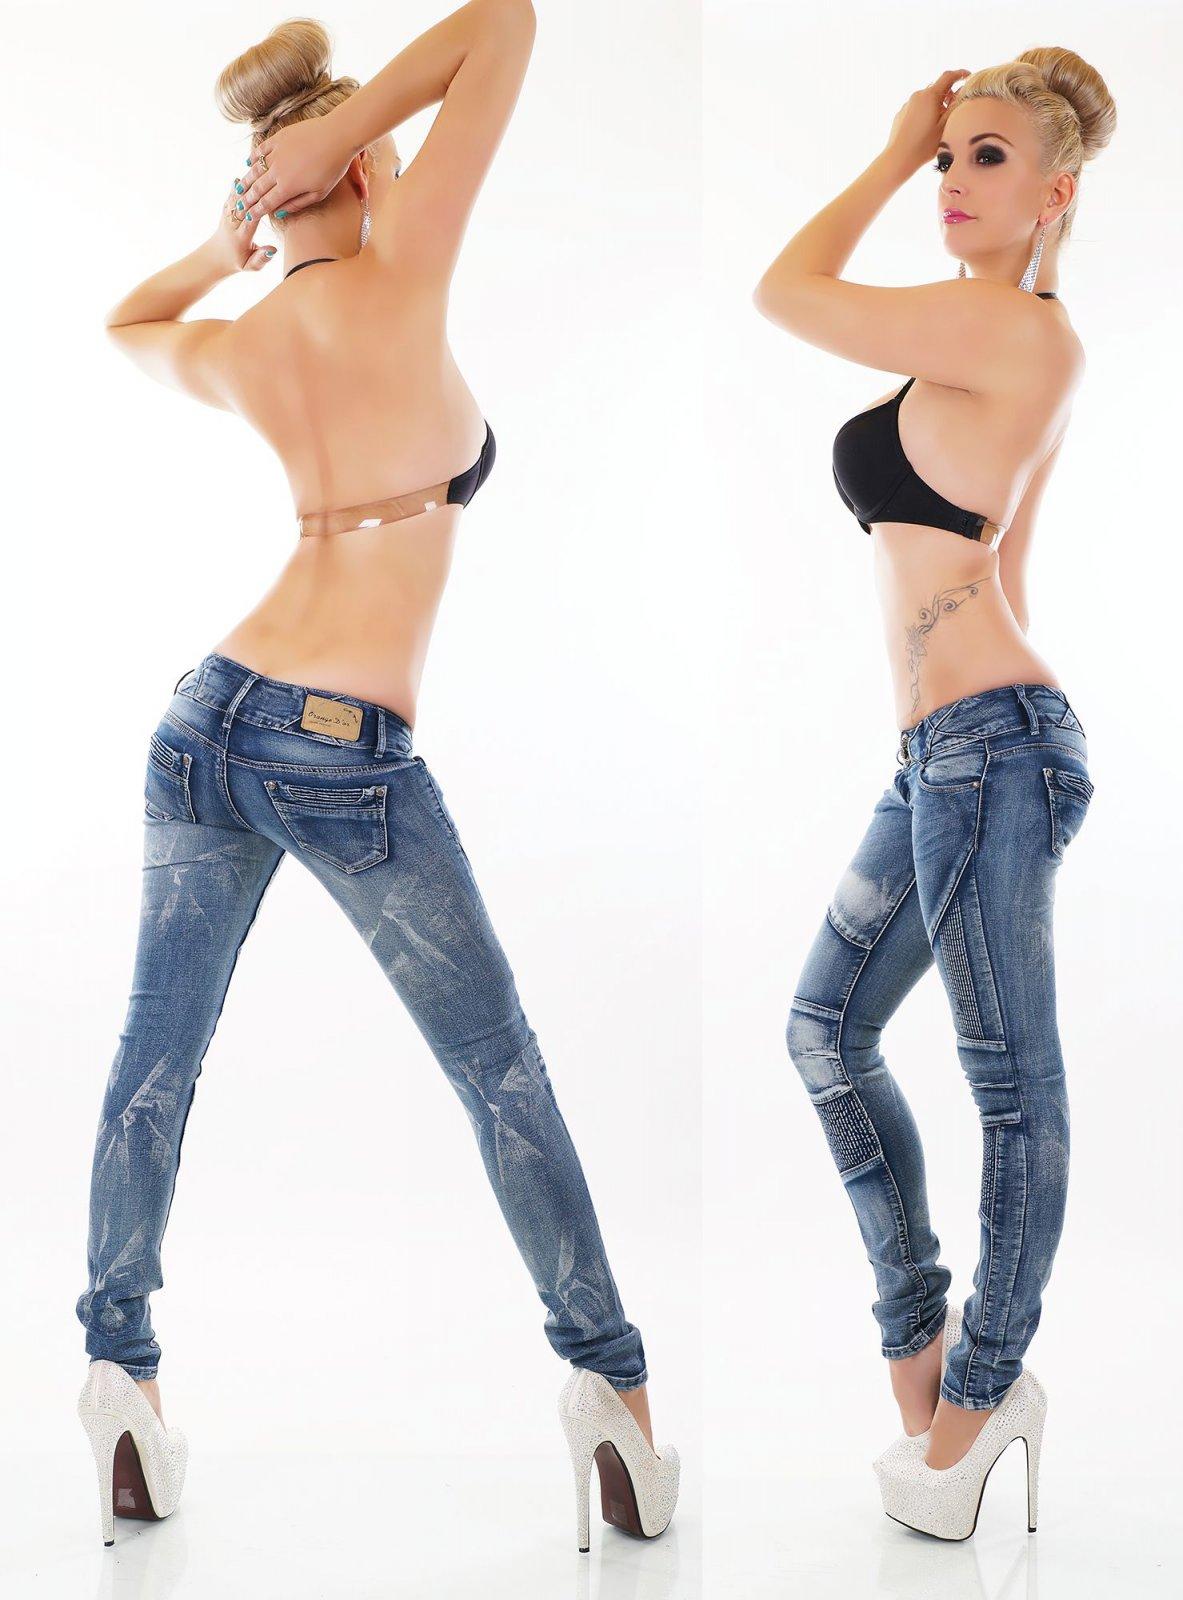 Damen Hoch Jeans Hose Röhrenjeans Skinny Röhre Biker Style Denim Waschung blau